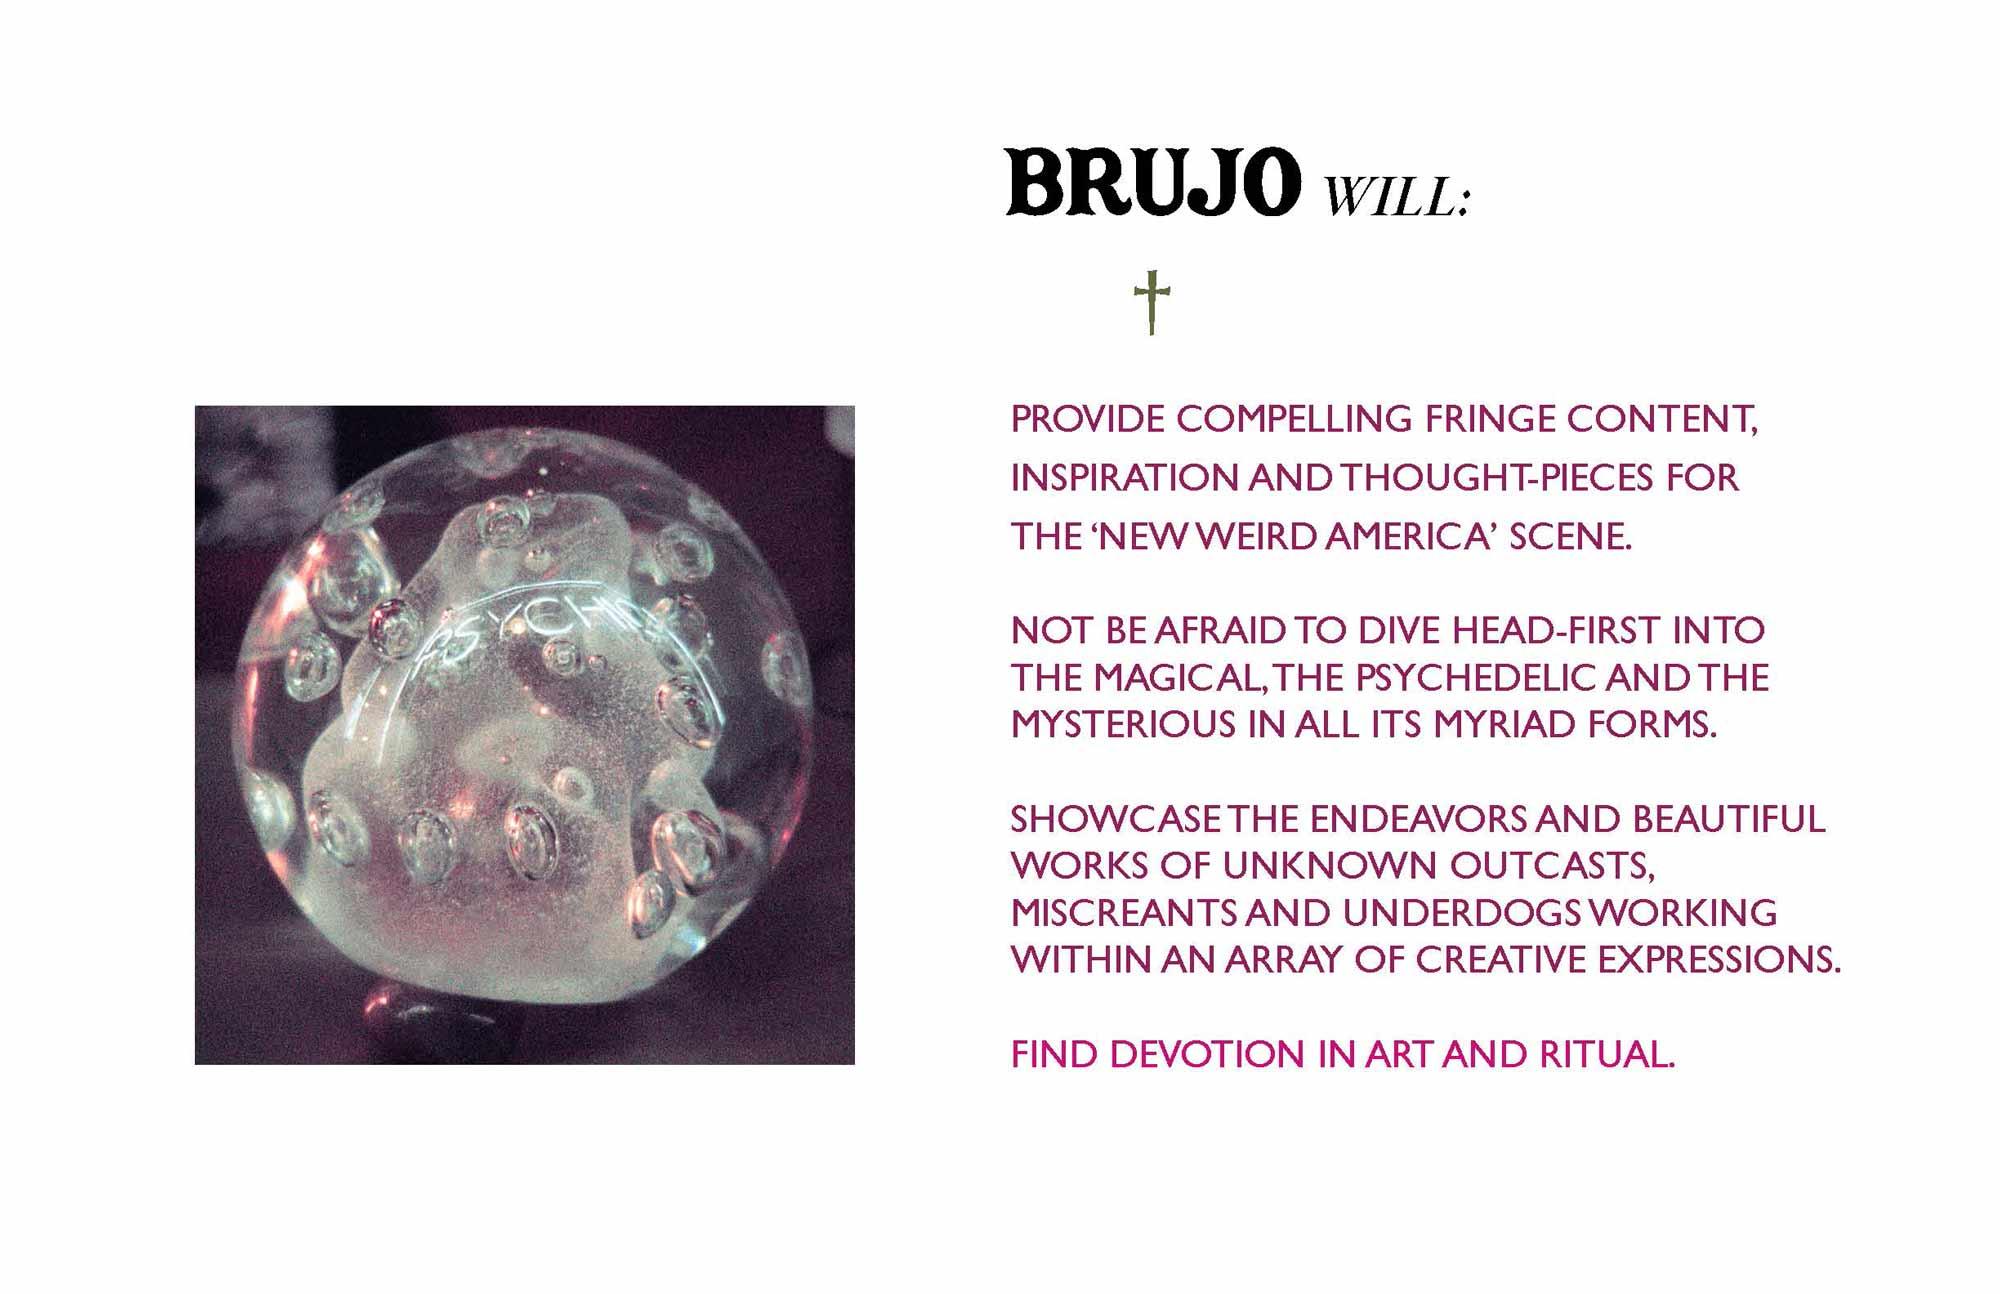 brujo-web-1